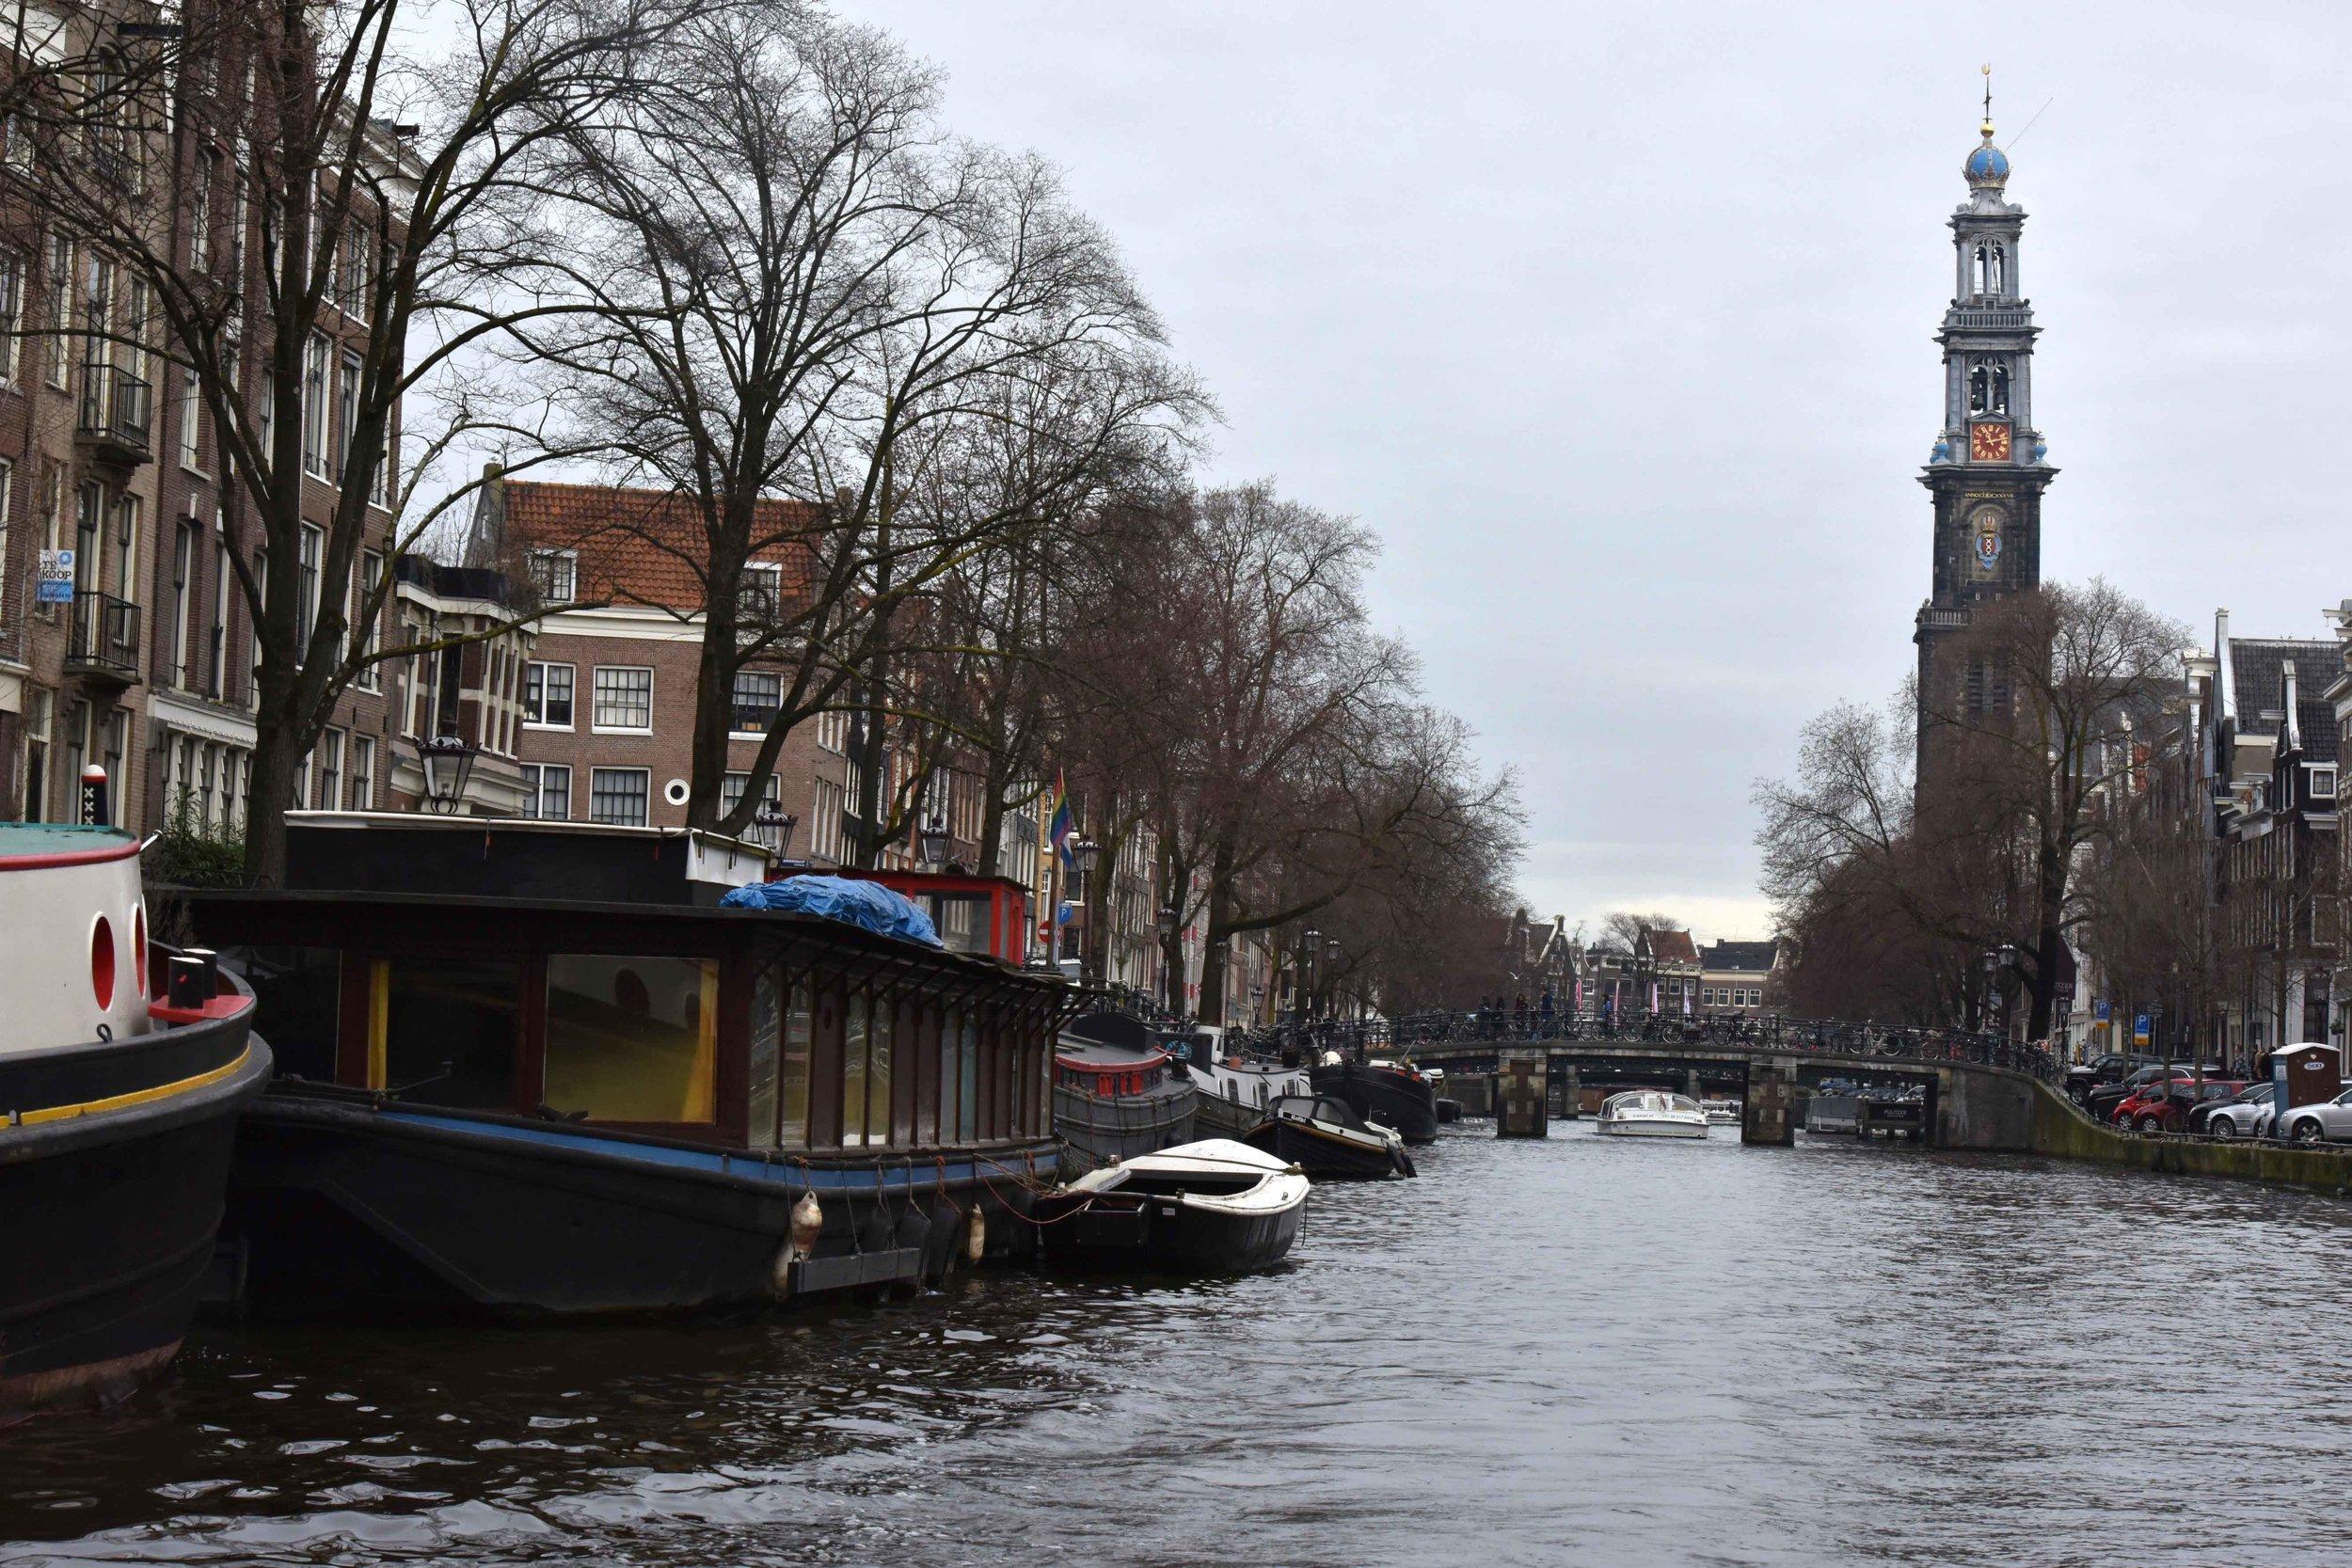 Houseboats,Amsterdam. Image©thingstodot.com